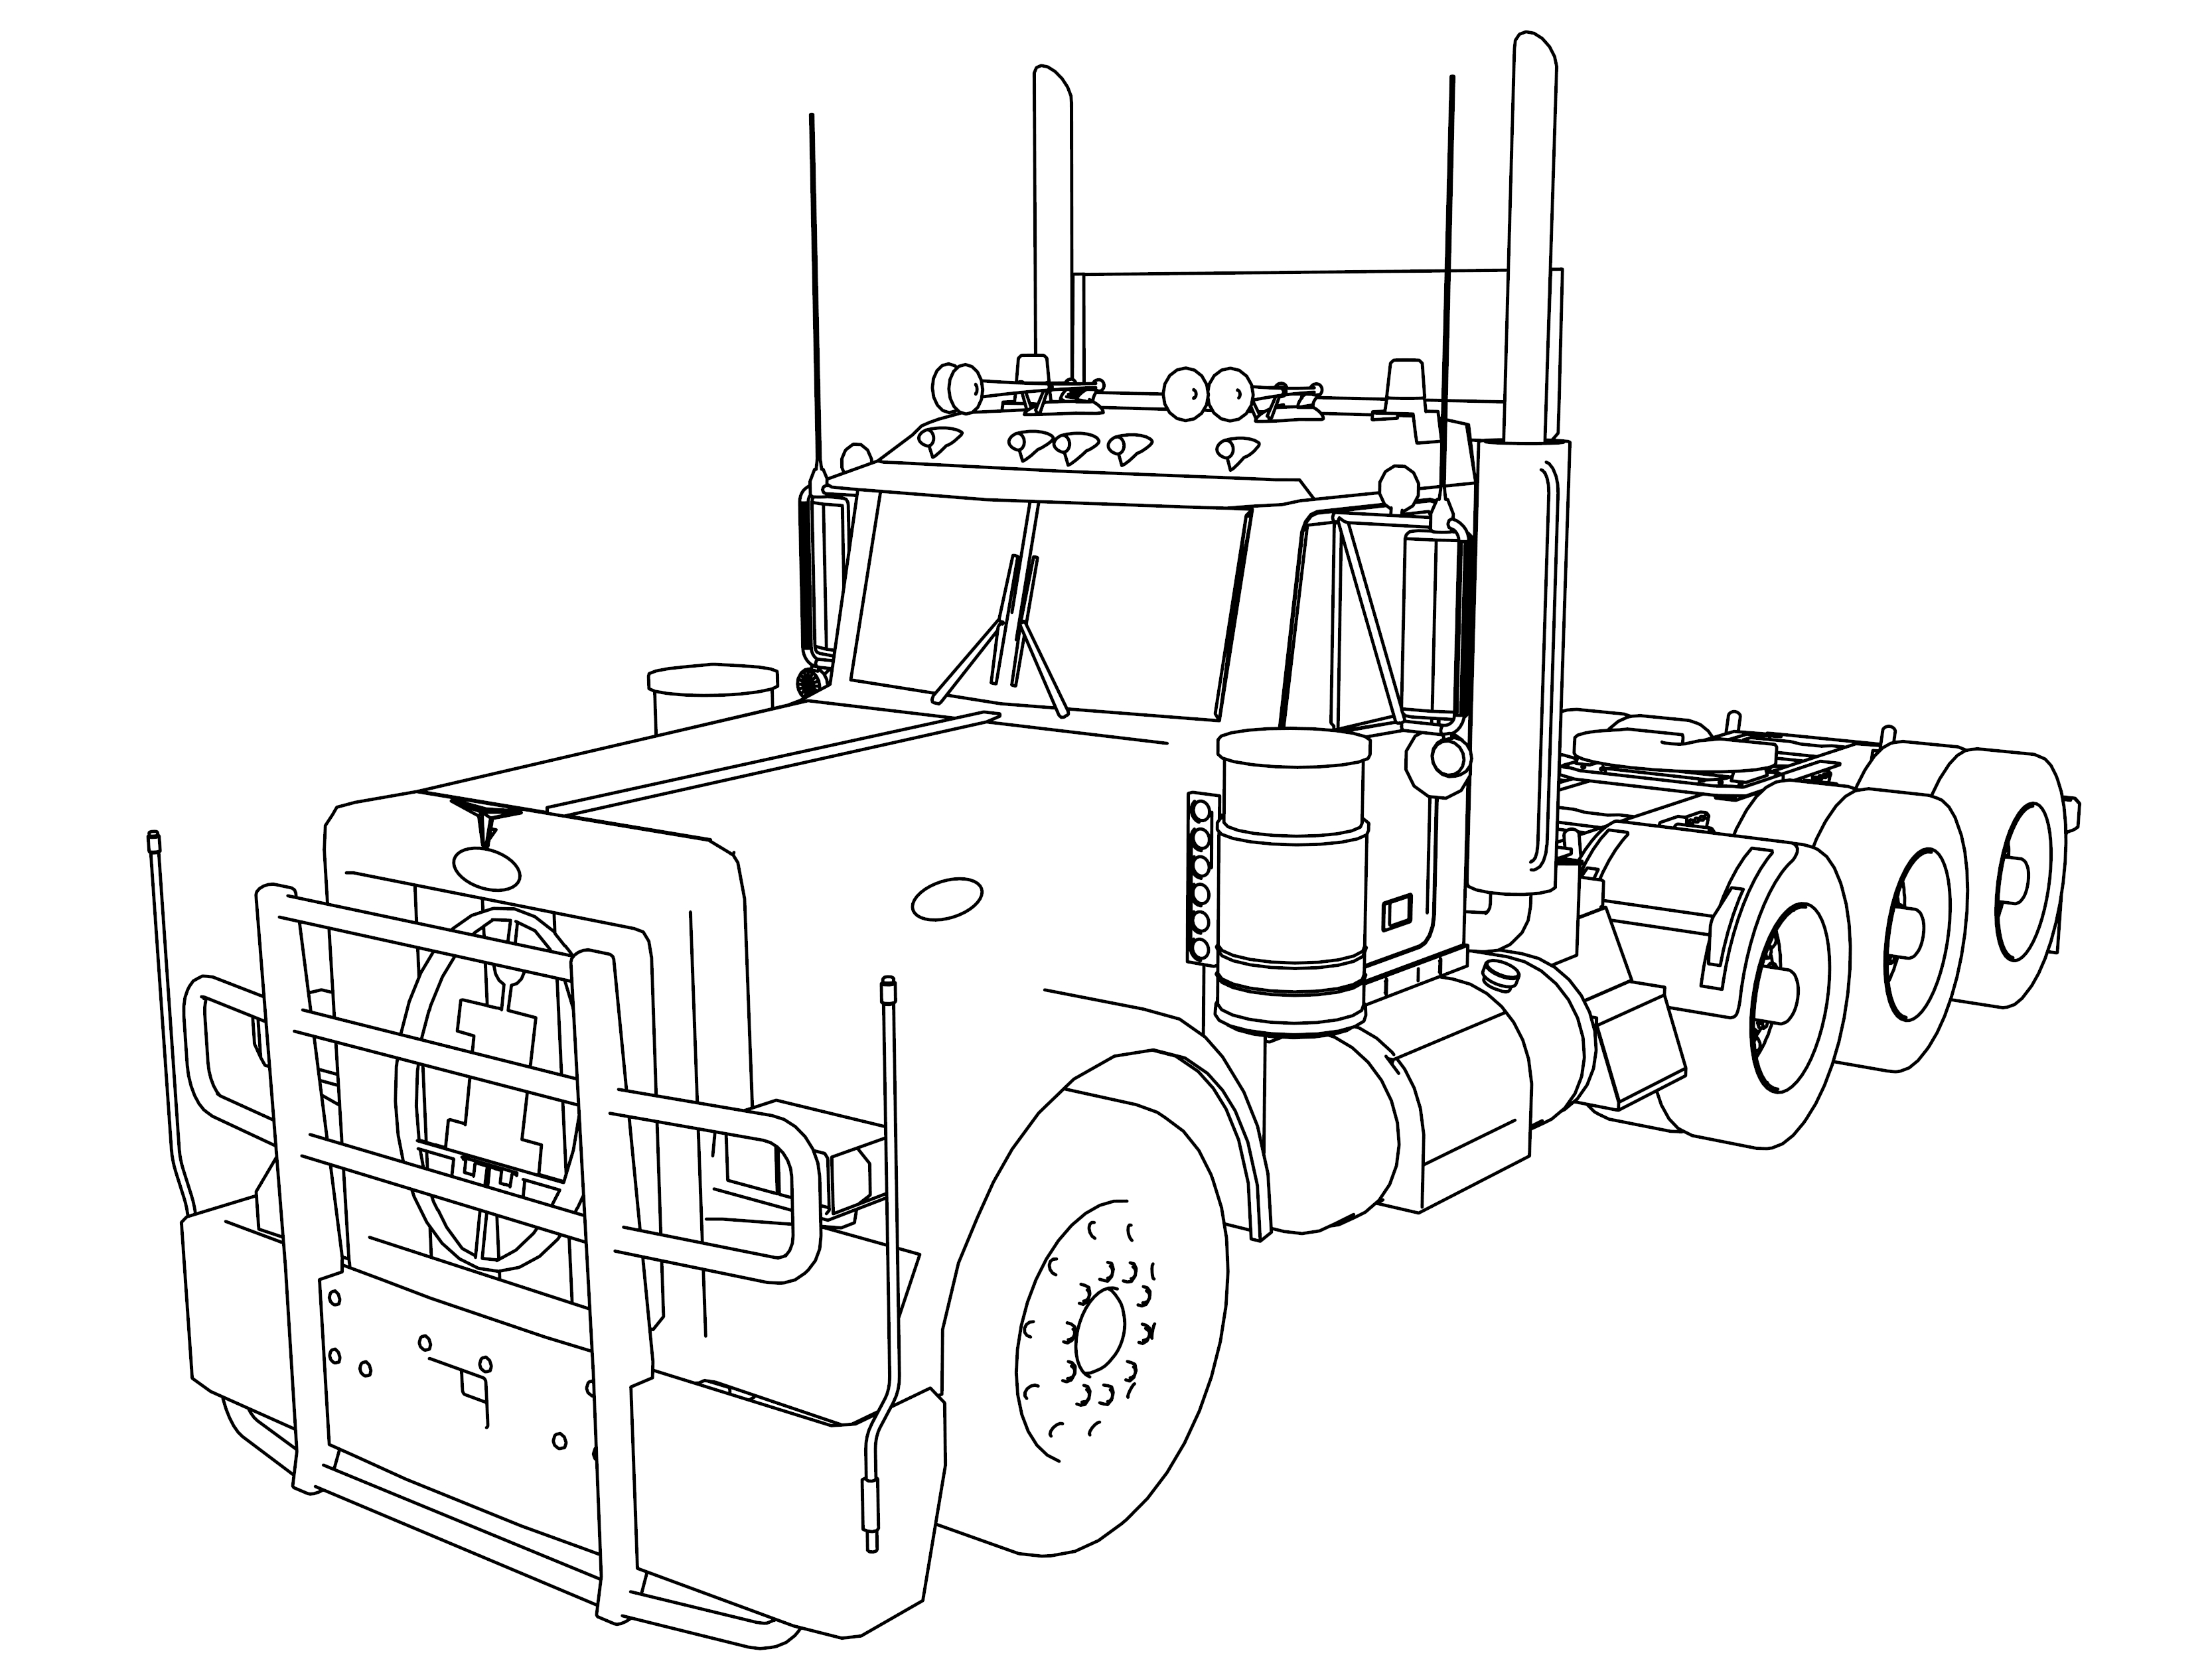 Semi Trucks Drawing at GetDrawings.com | Free for personal use Semi ...